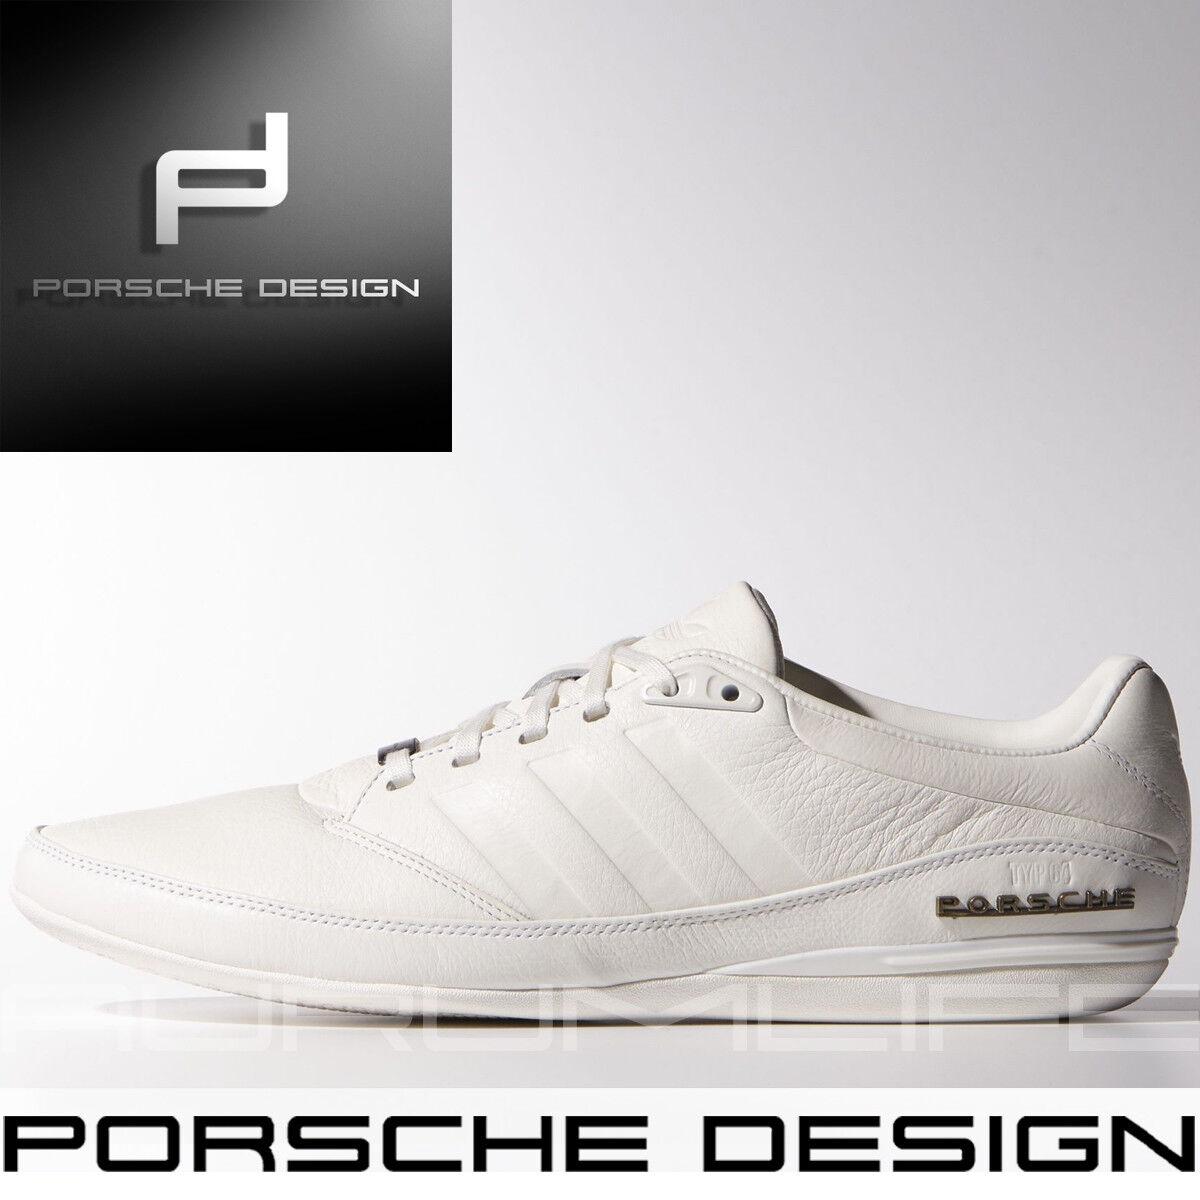 Adidas Porsche Design Drive TYP 64 2.0 White Shoes Bounce Mens Leather M20587